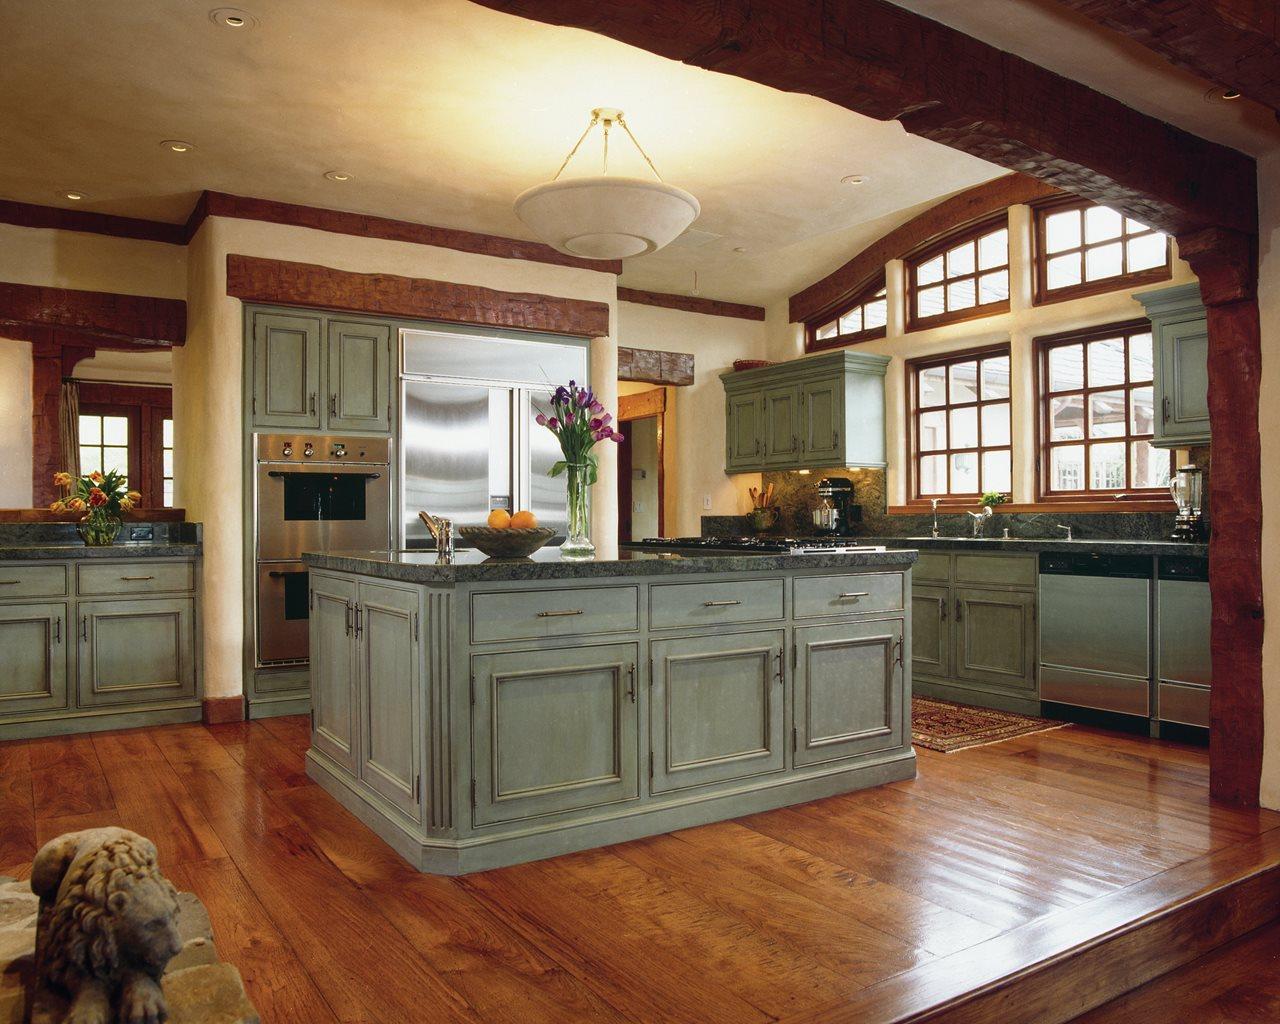 Interior design english home - English Style Interior Design Ideas